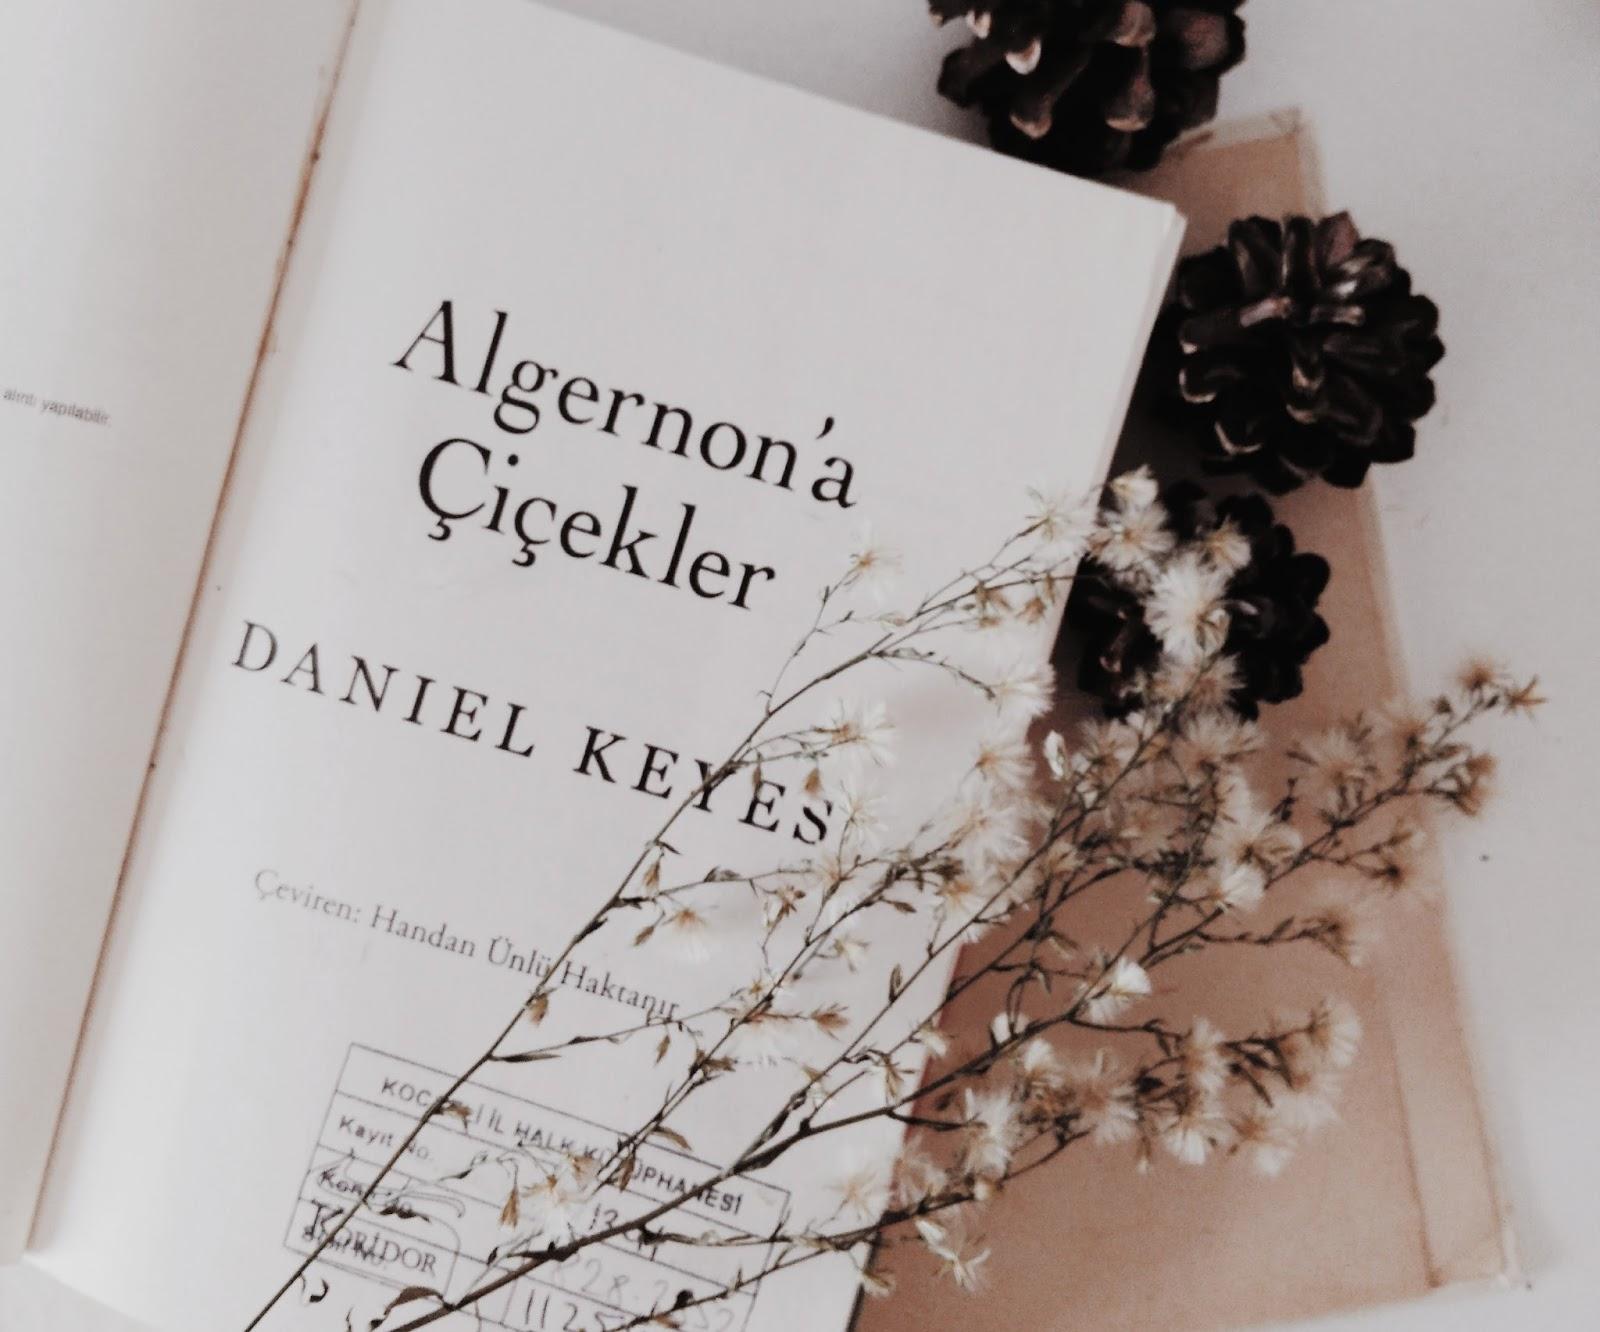 algernon'a çiçekler, daniel keyes, flowers for algernon